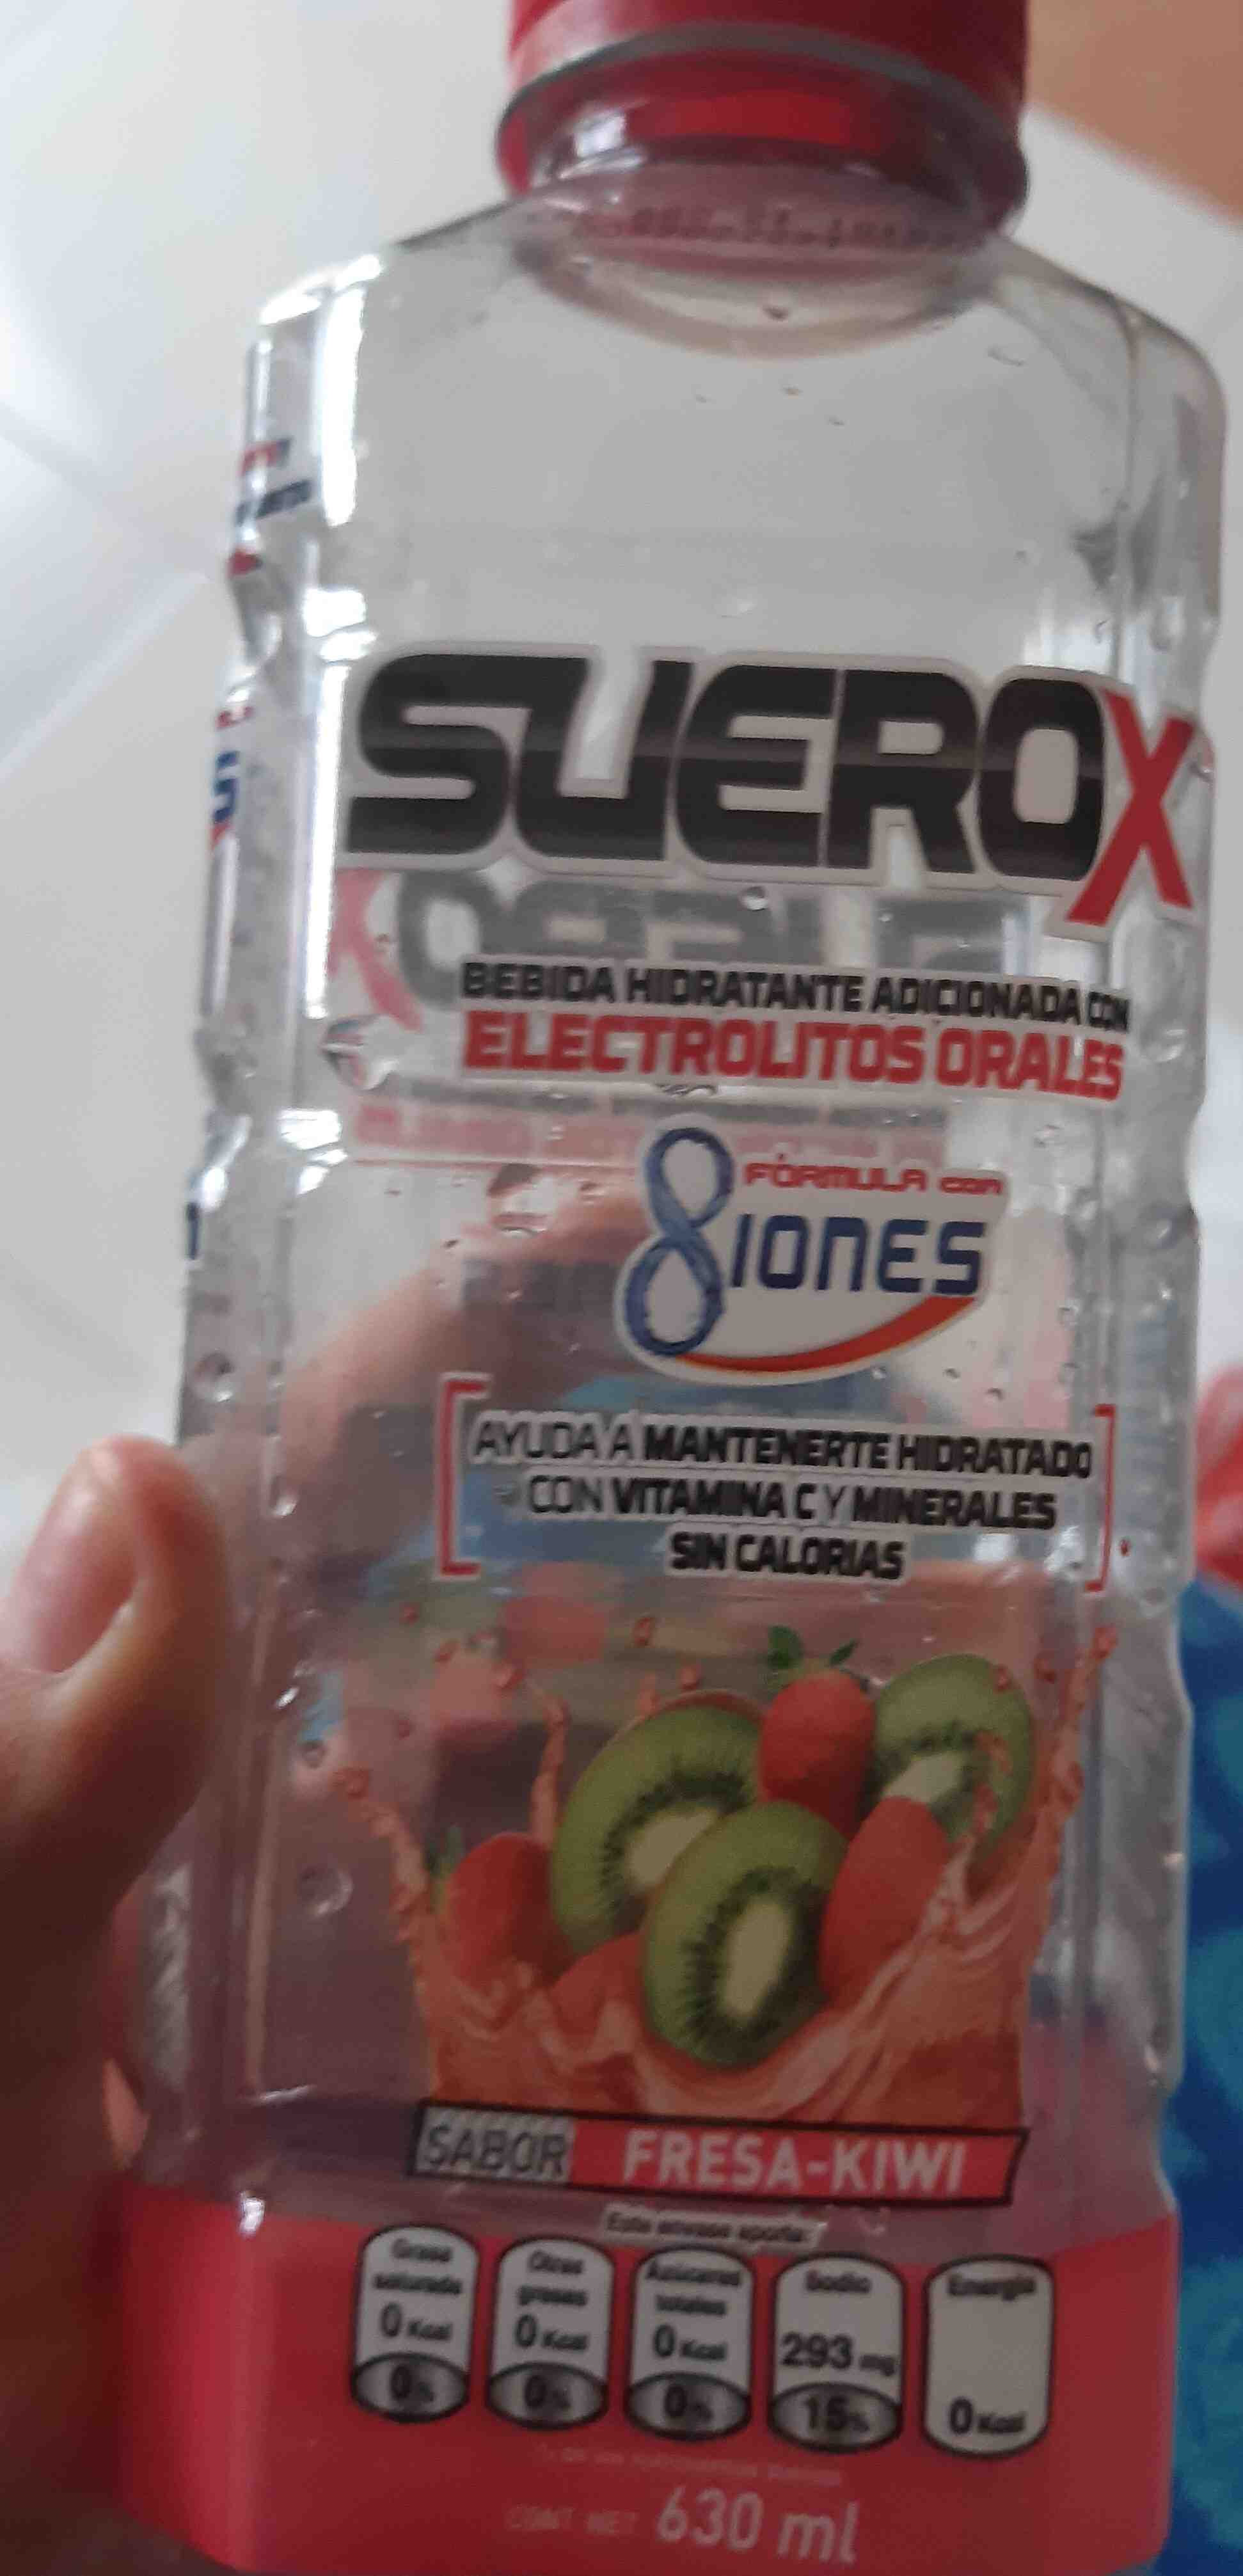 Suerox Rehidratante de Fresa - Product - en